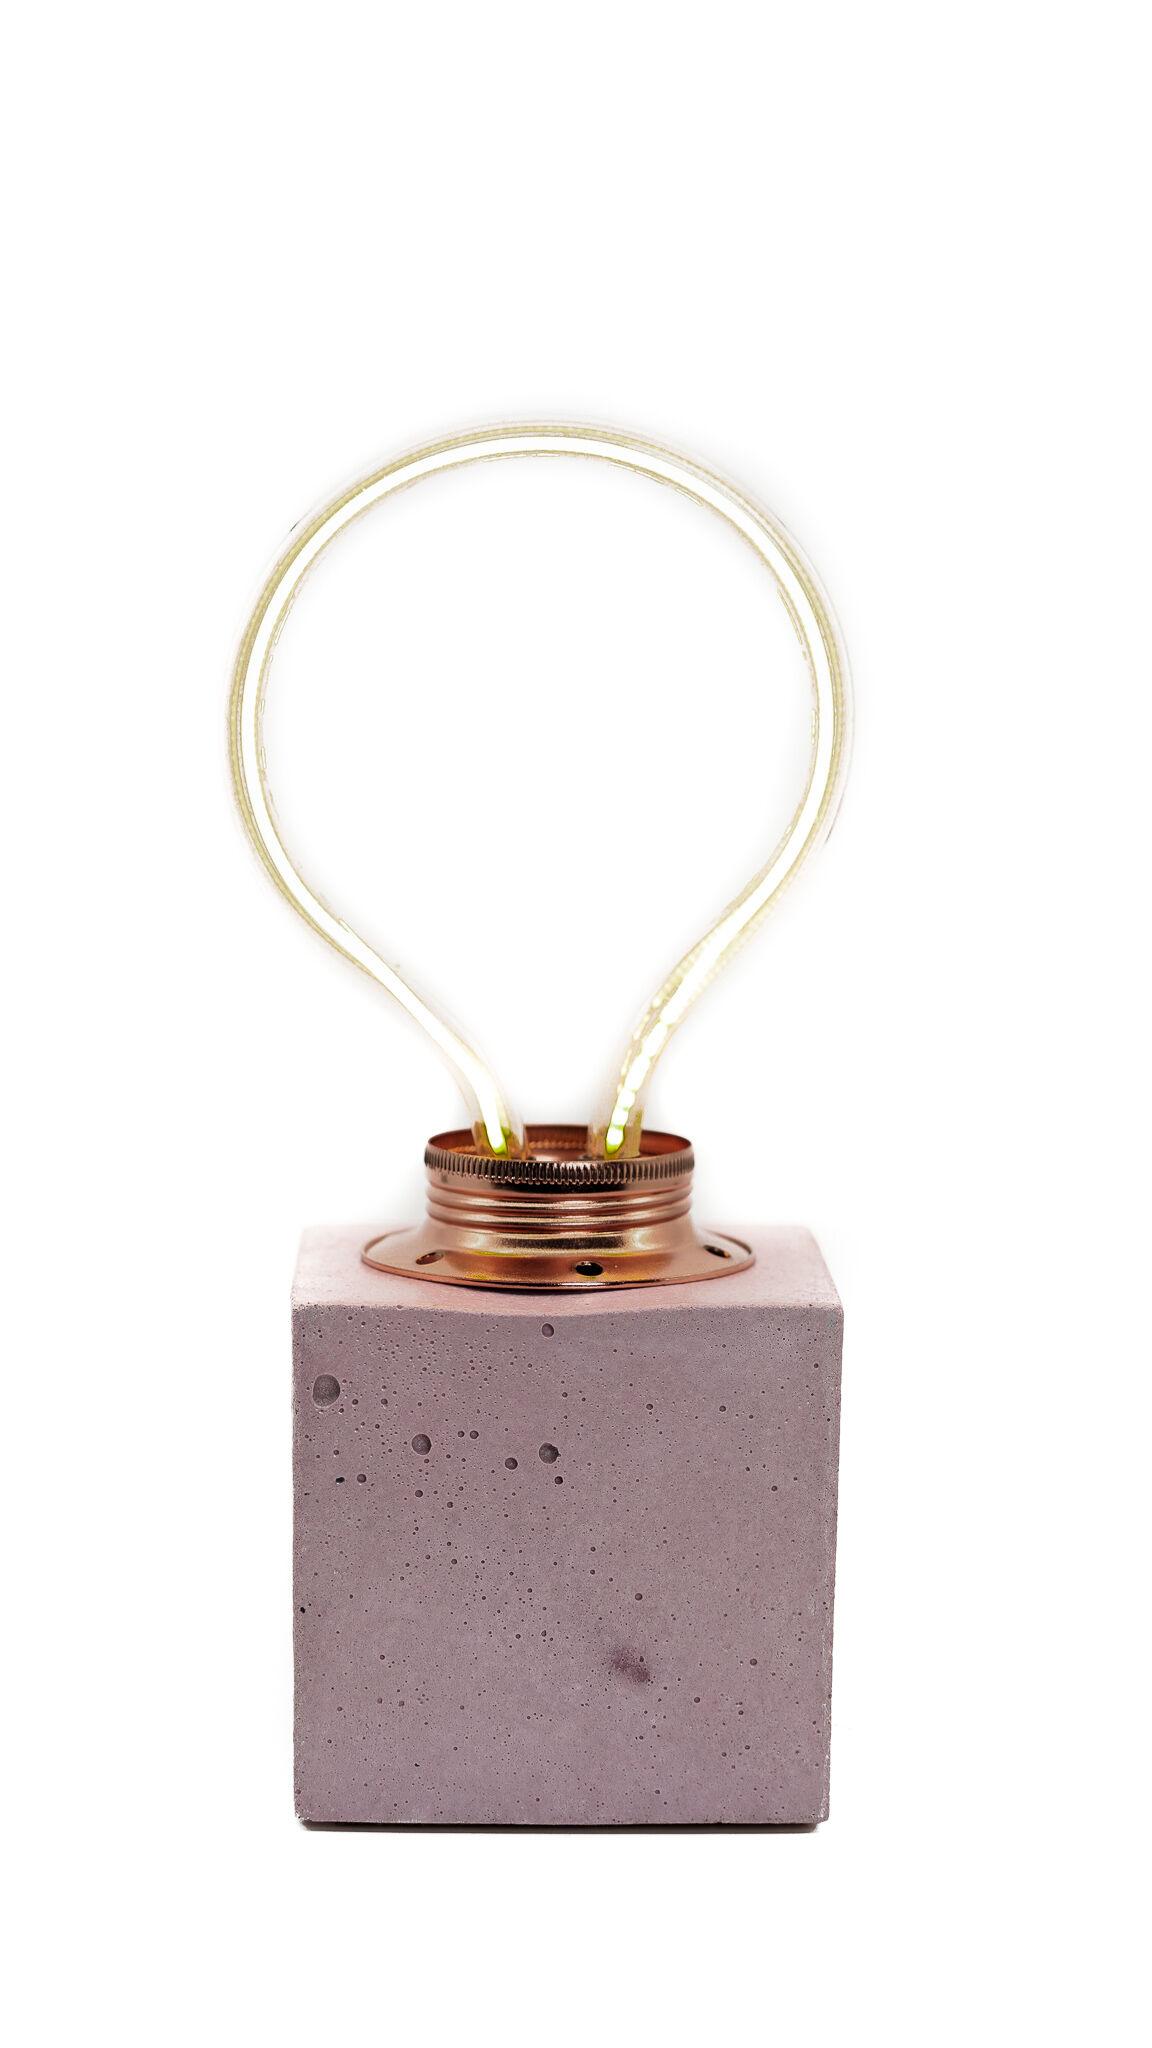 Junny Lampe cube néon en béton rose fabrication artisanale